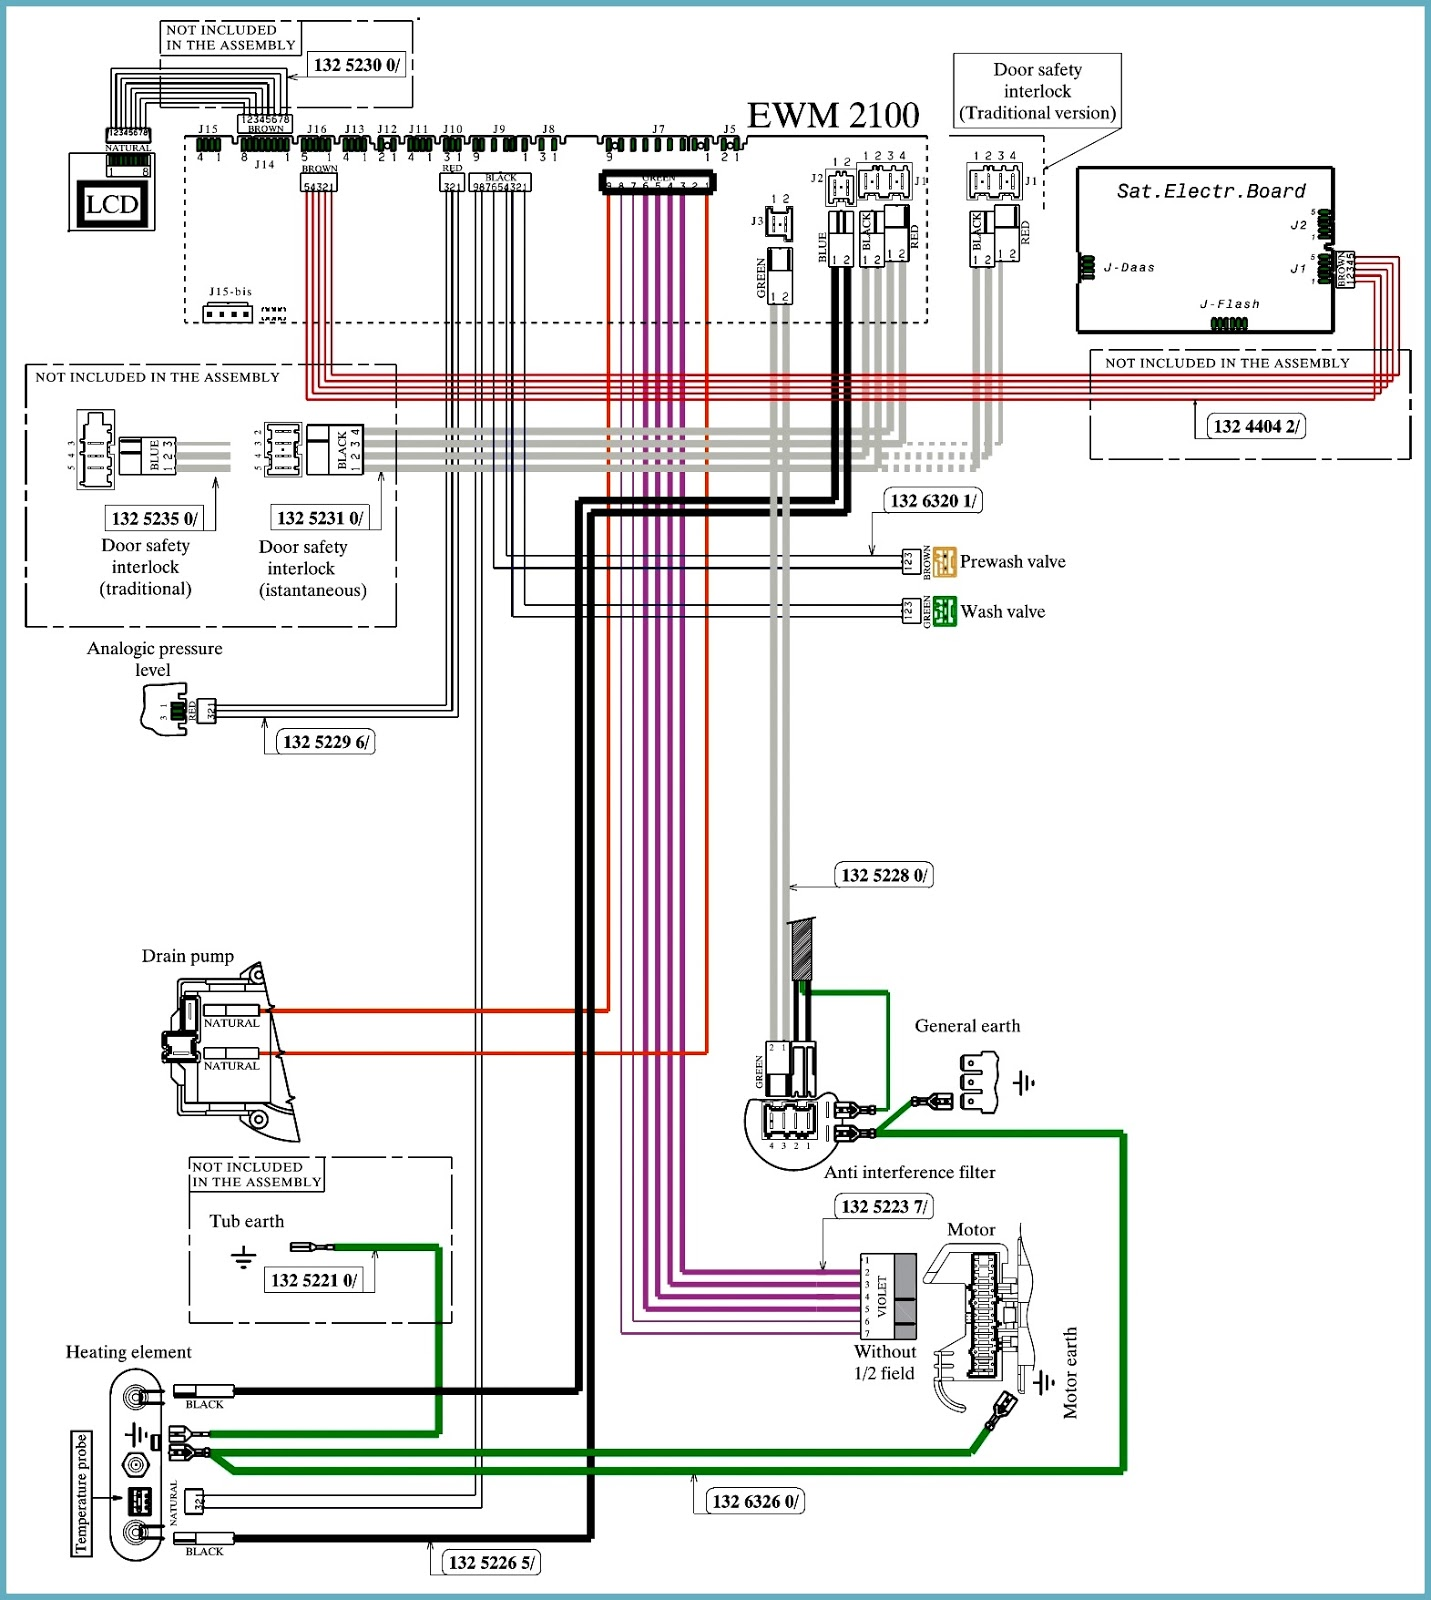 medium resolution of mod wiring electrolux diagram frc05lsdwo wiring diagram mod wiring electrolux diagram frc05lsdwo